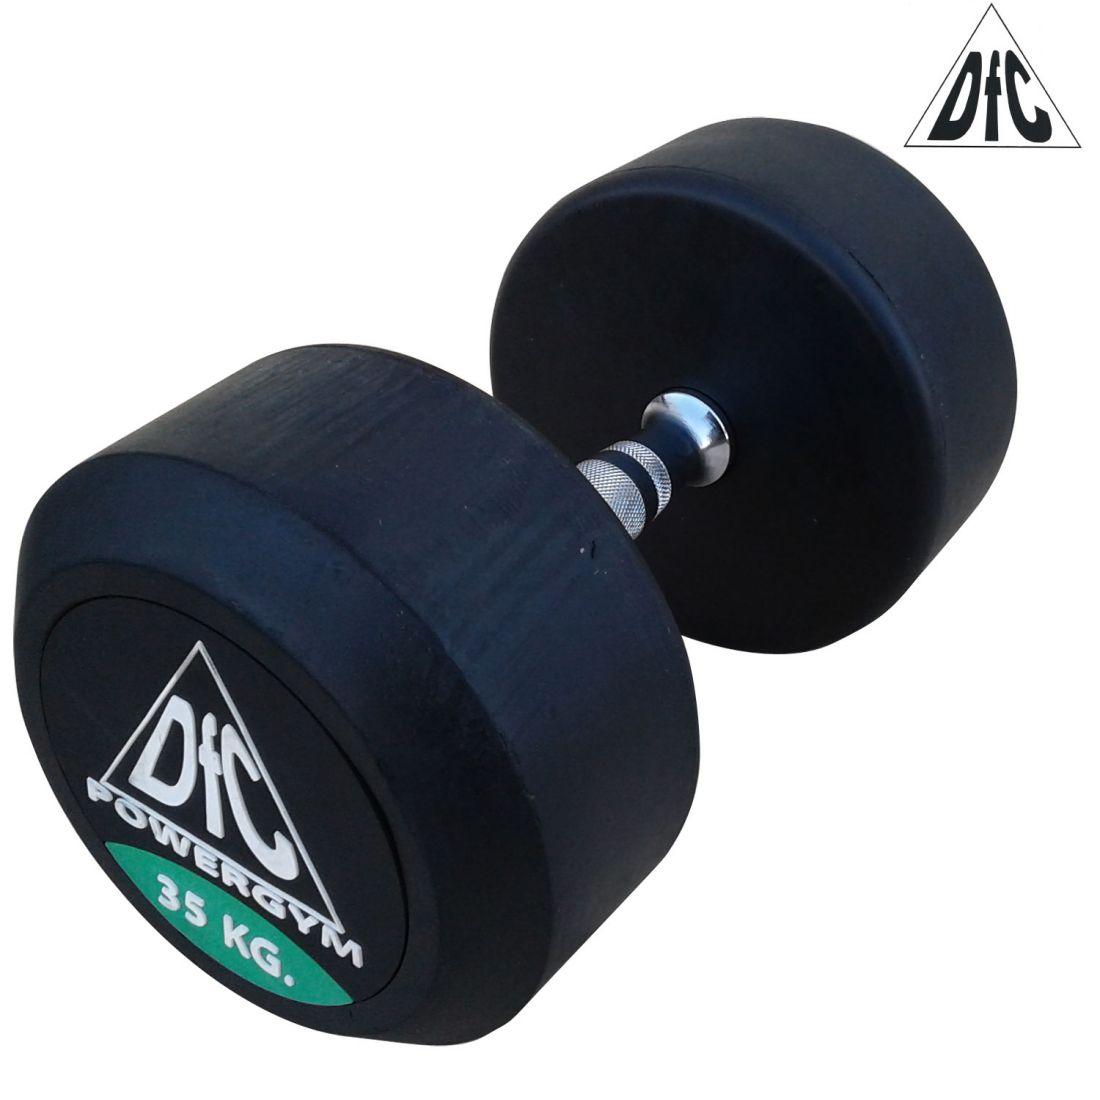 Гантели пара 35 кг DFC POWERGYM DB002-35